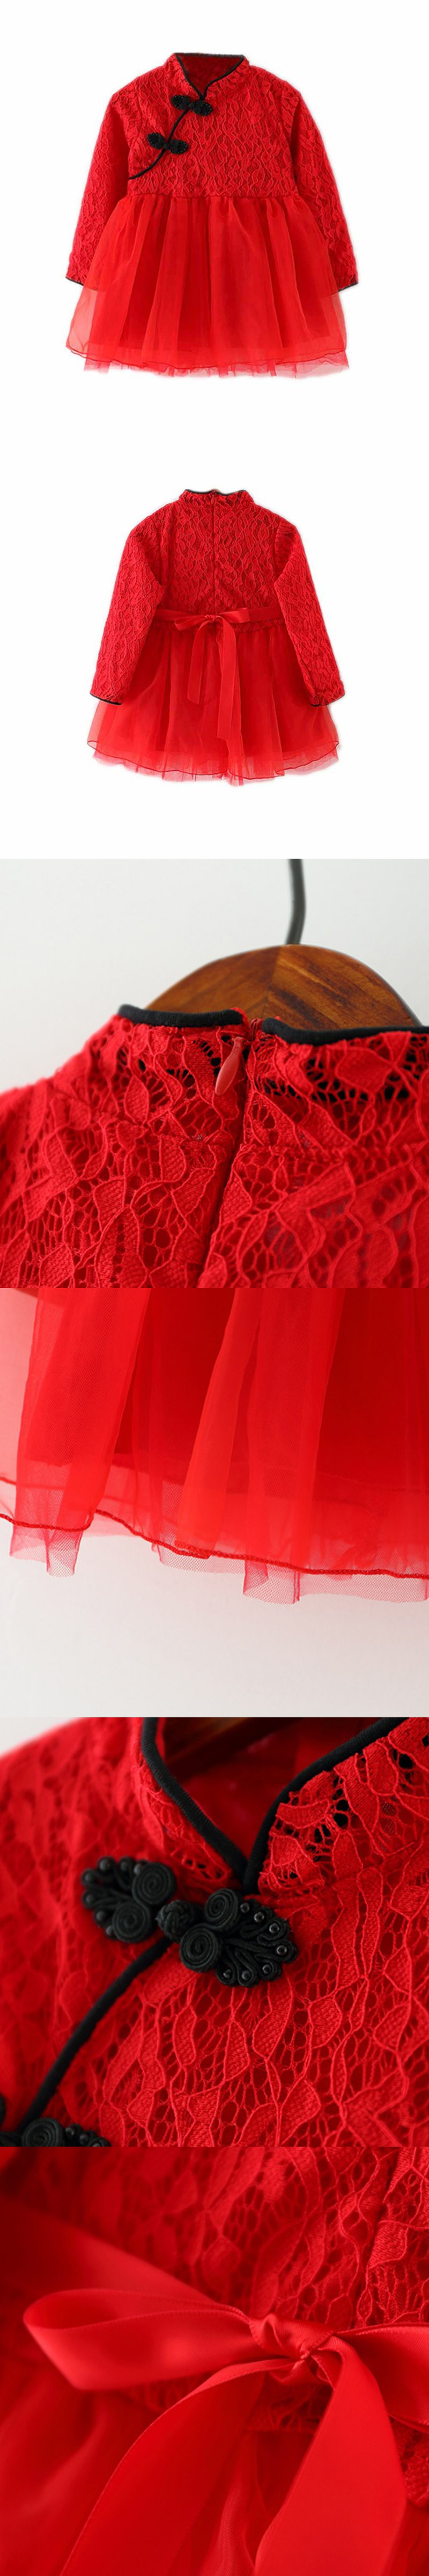 Classic Girl Kid Baby Red Cheongsam Dress Chinese Qipao Clothes